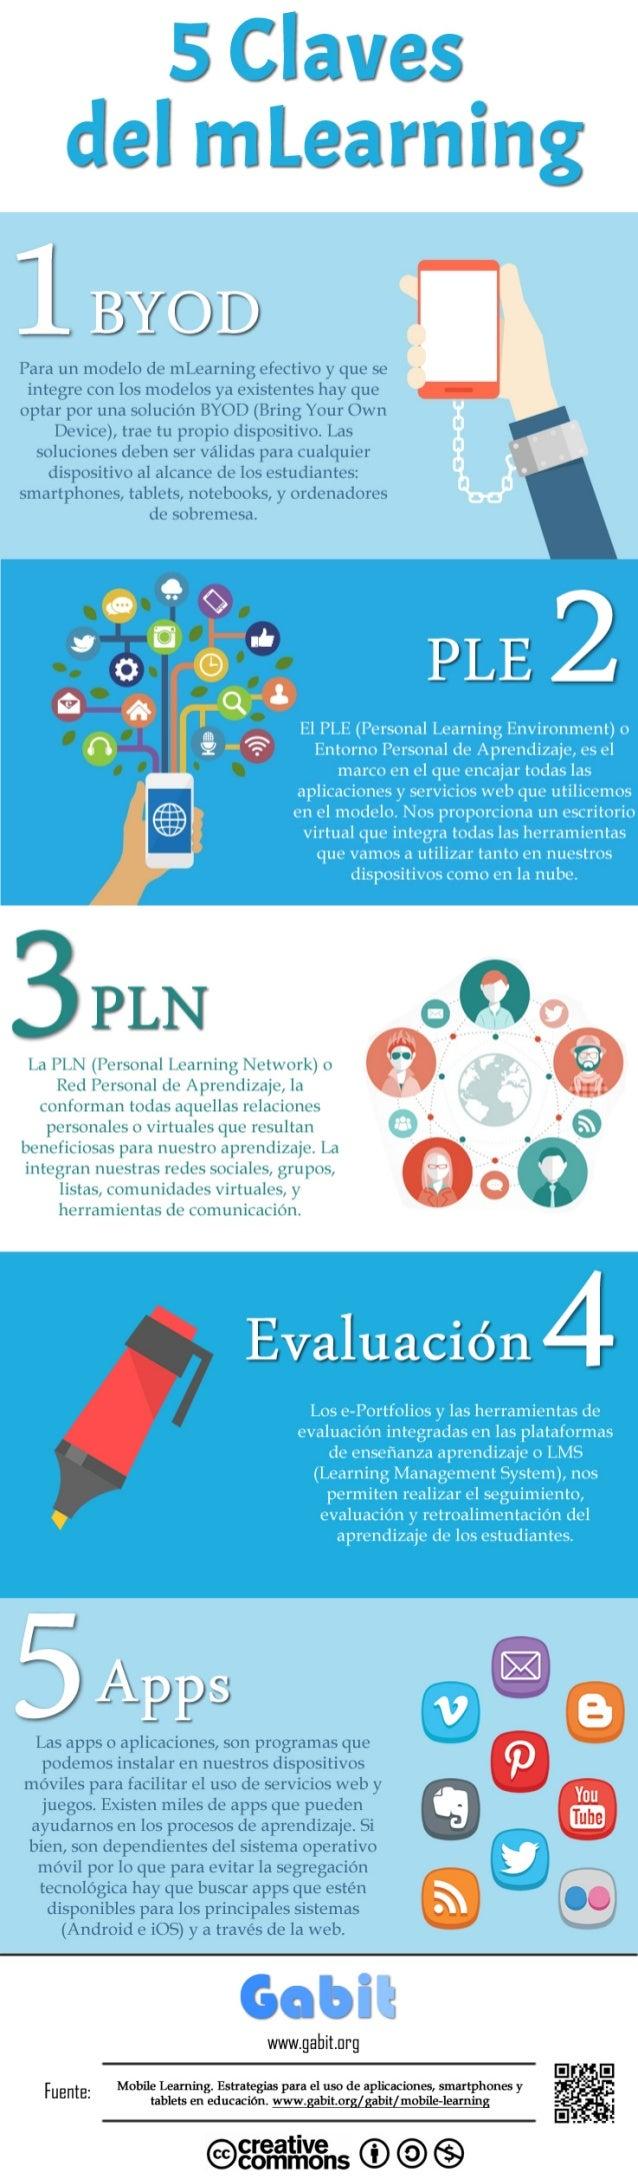 5 Claves del mLearning (Infografía) (Español)